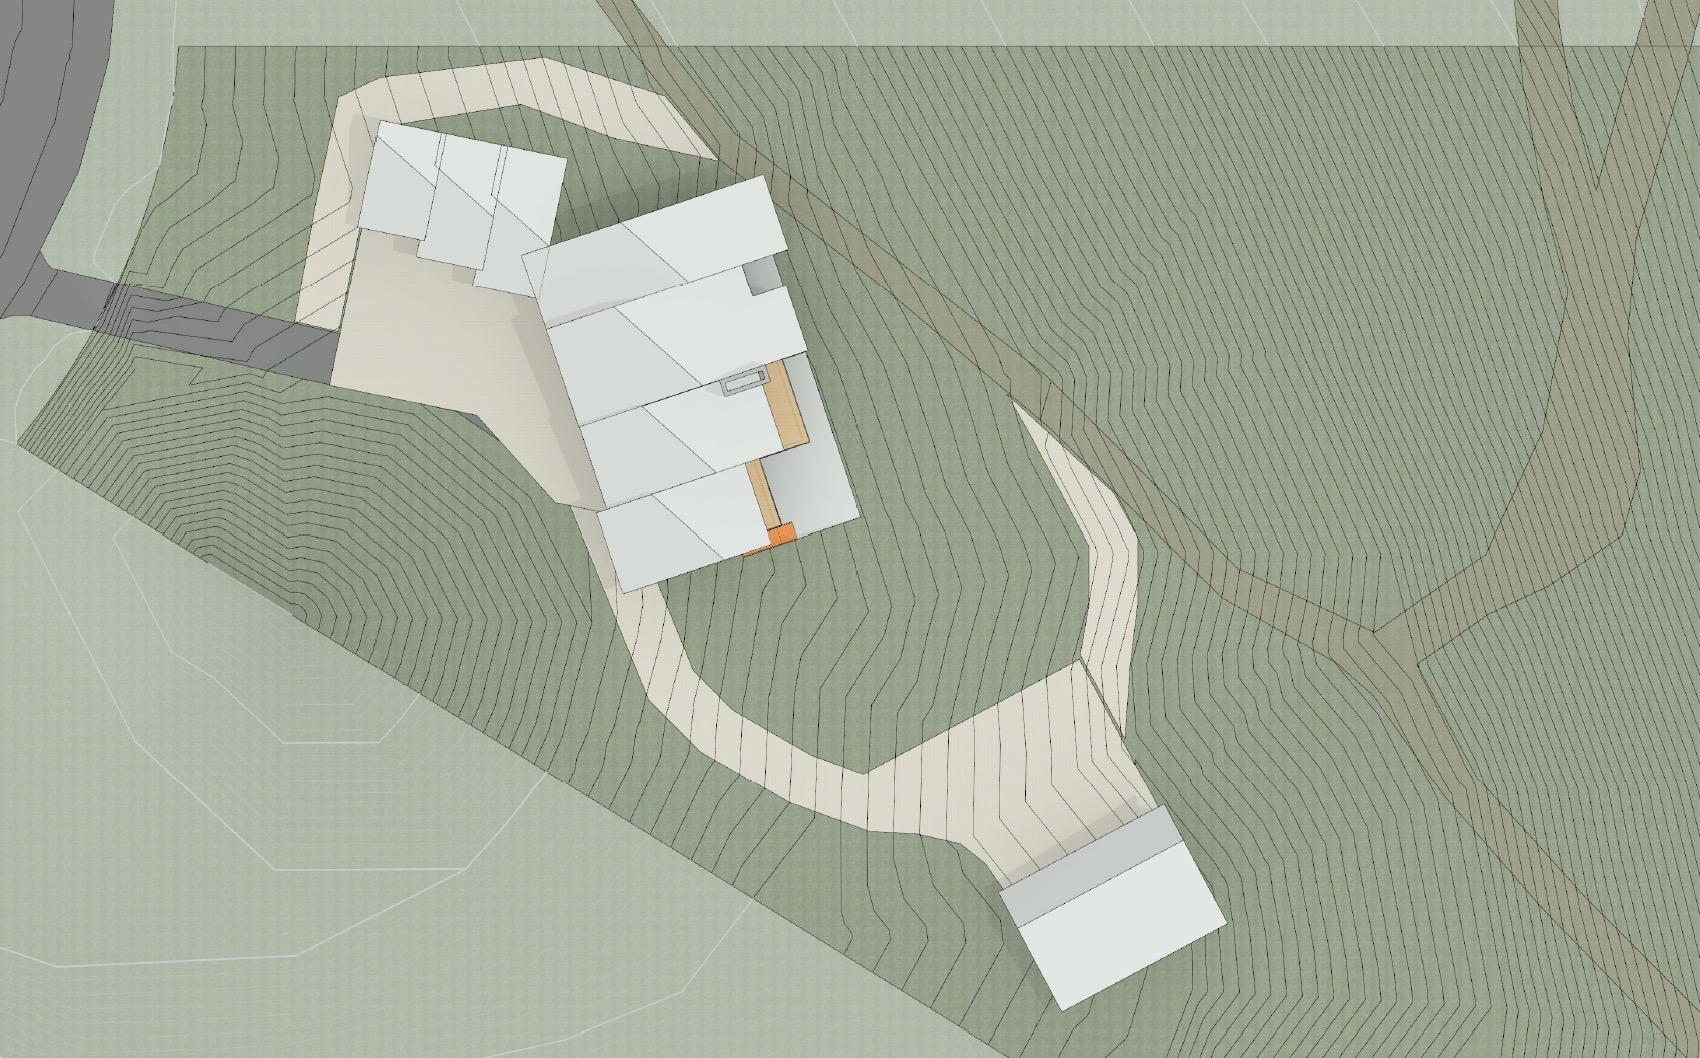 mountain-house-topography.JPG